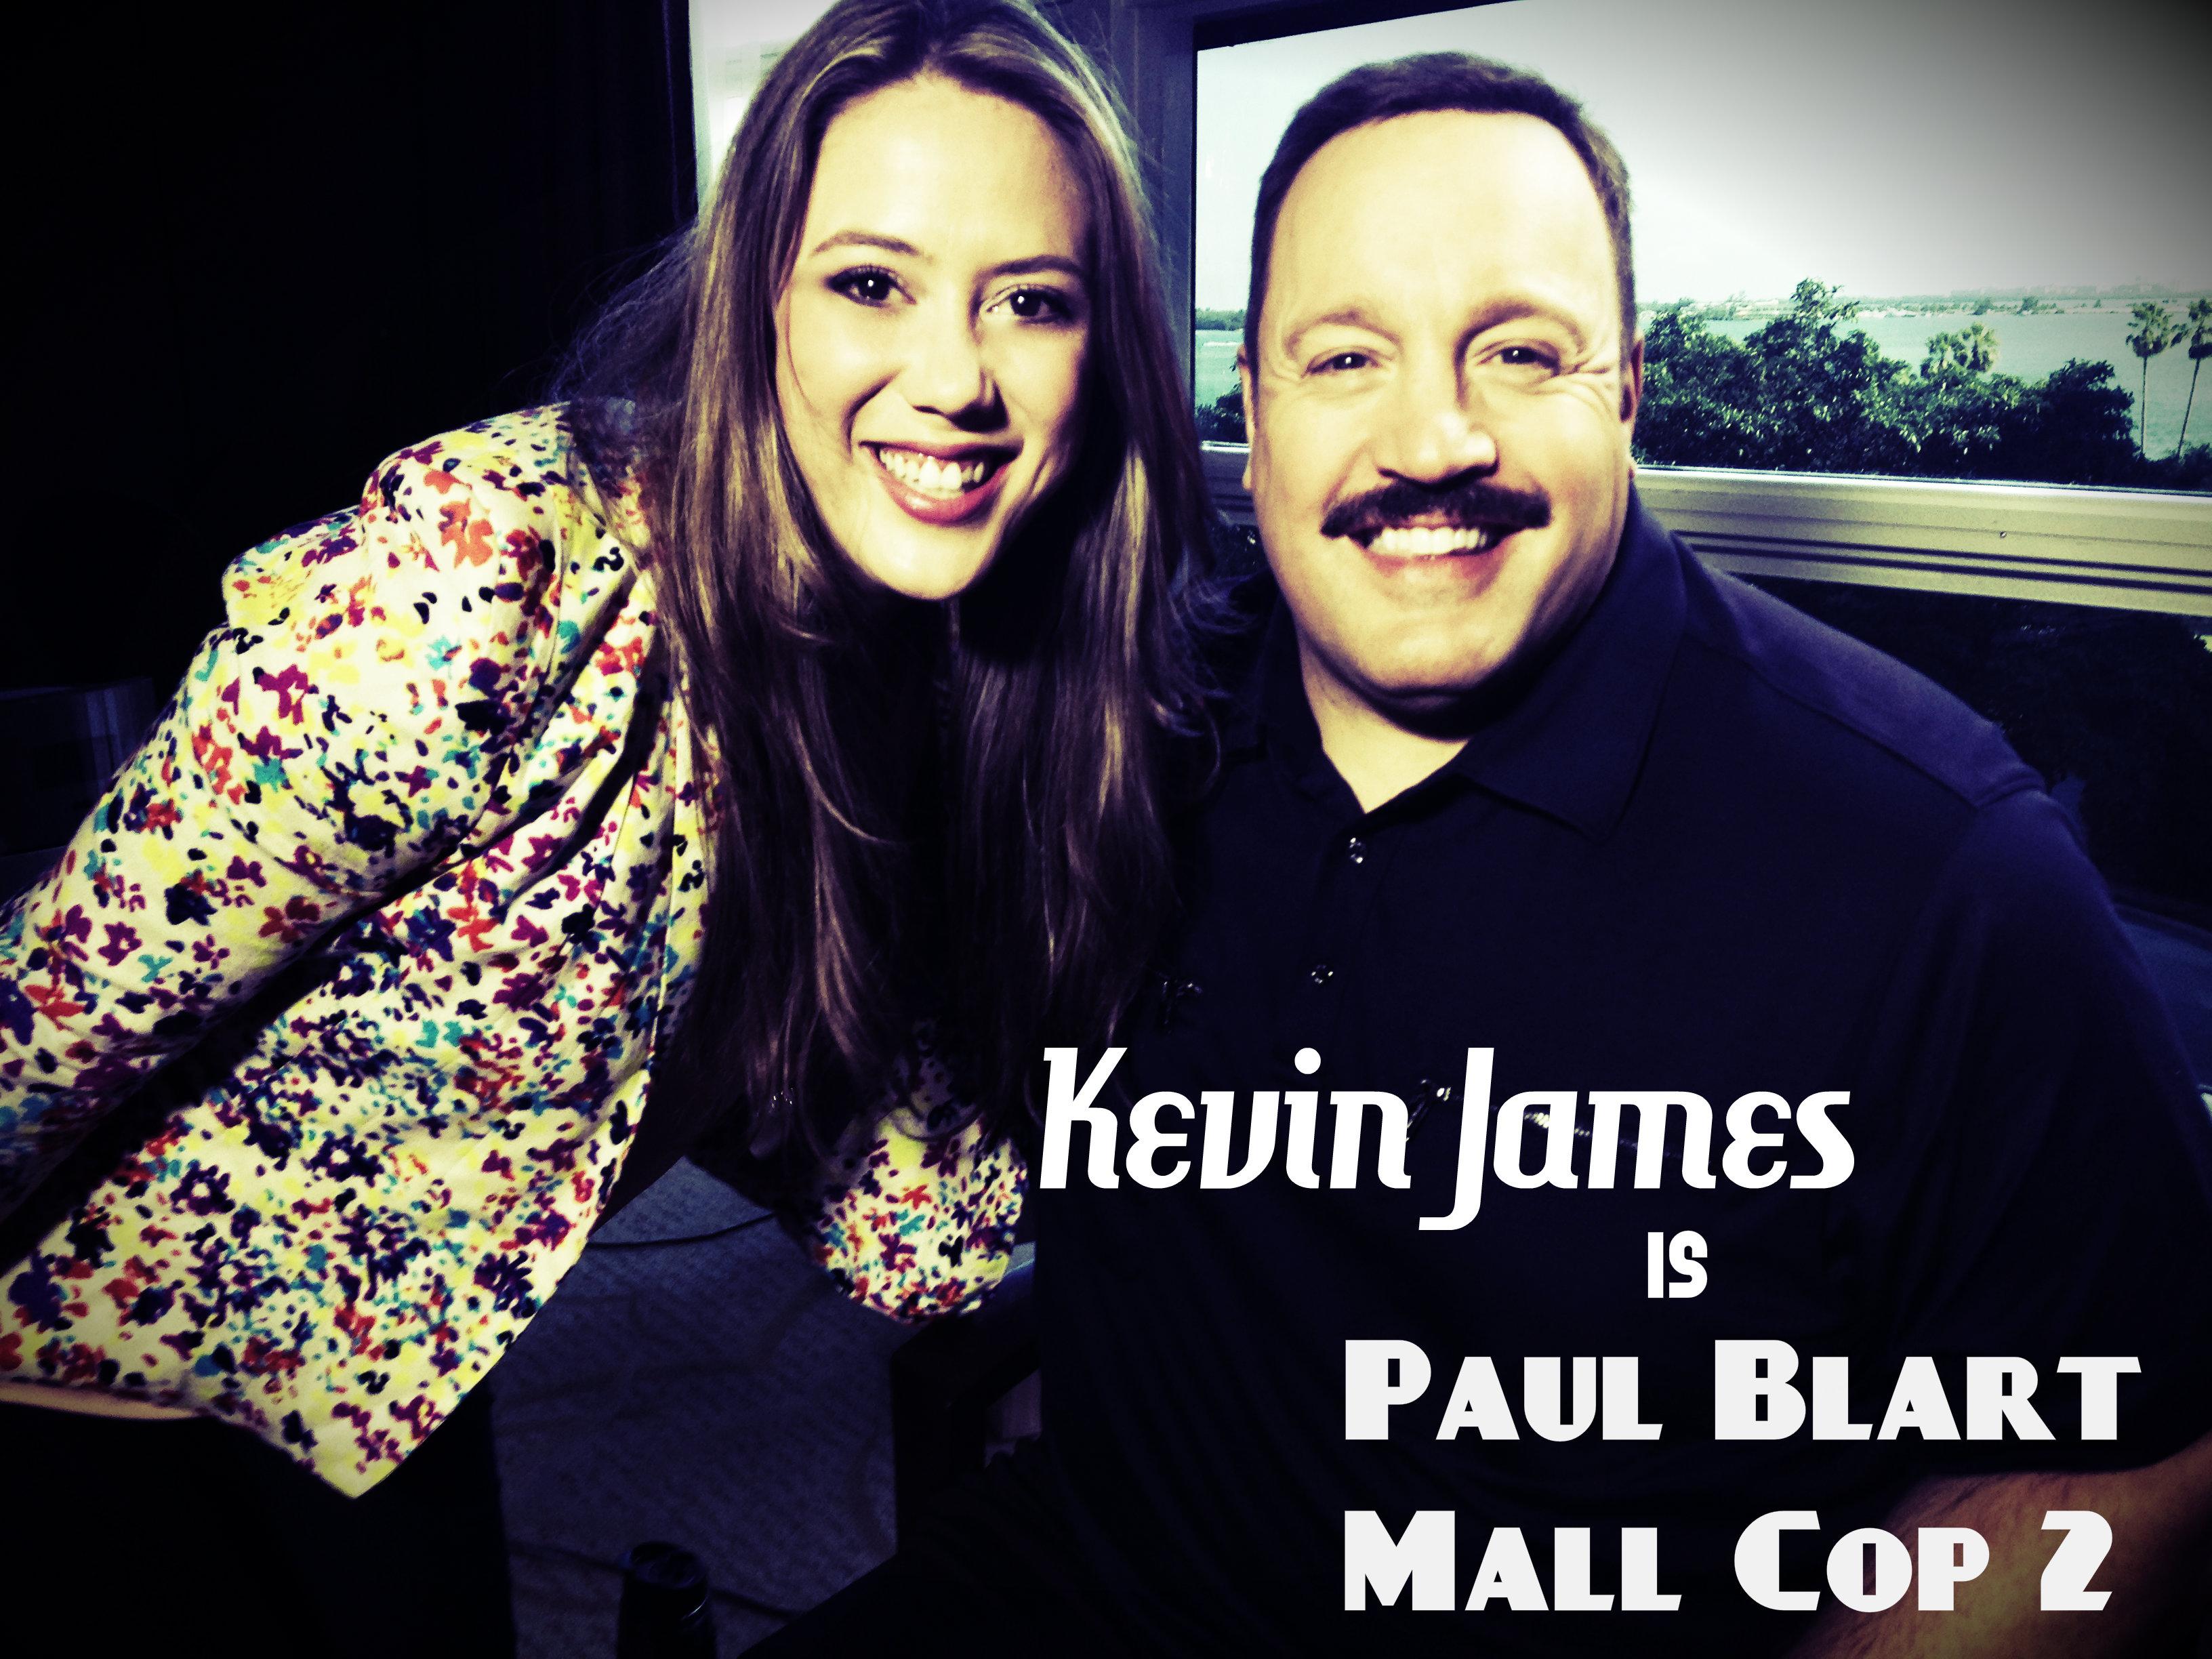 Kevin James talks to Meli Hernandez de Paul Blart Mall Cop 2